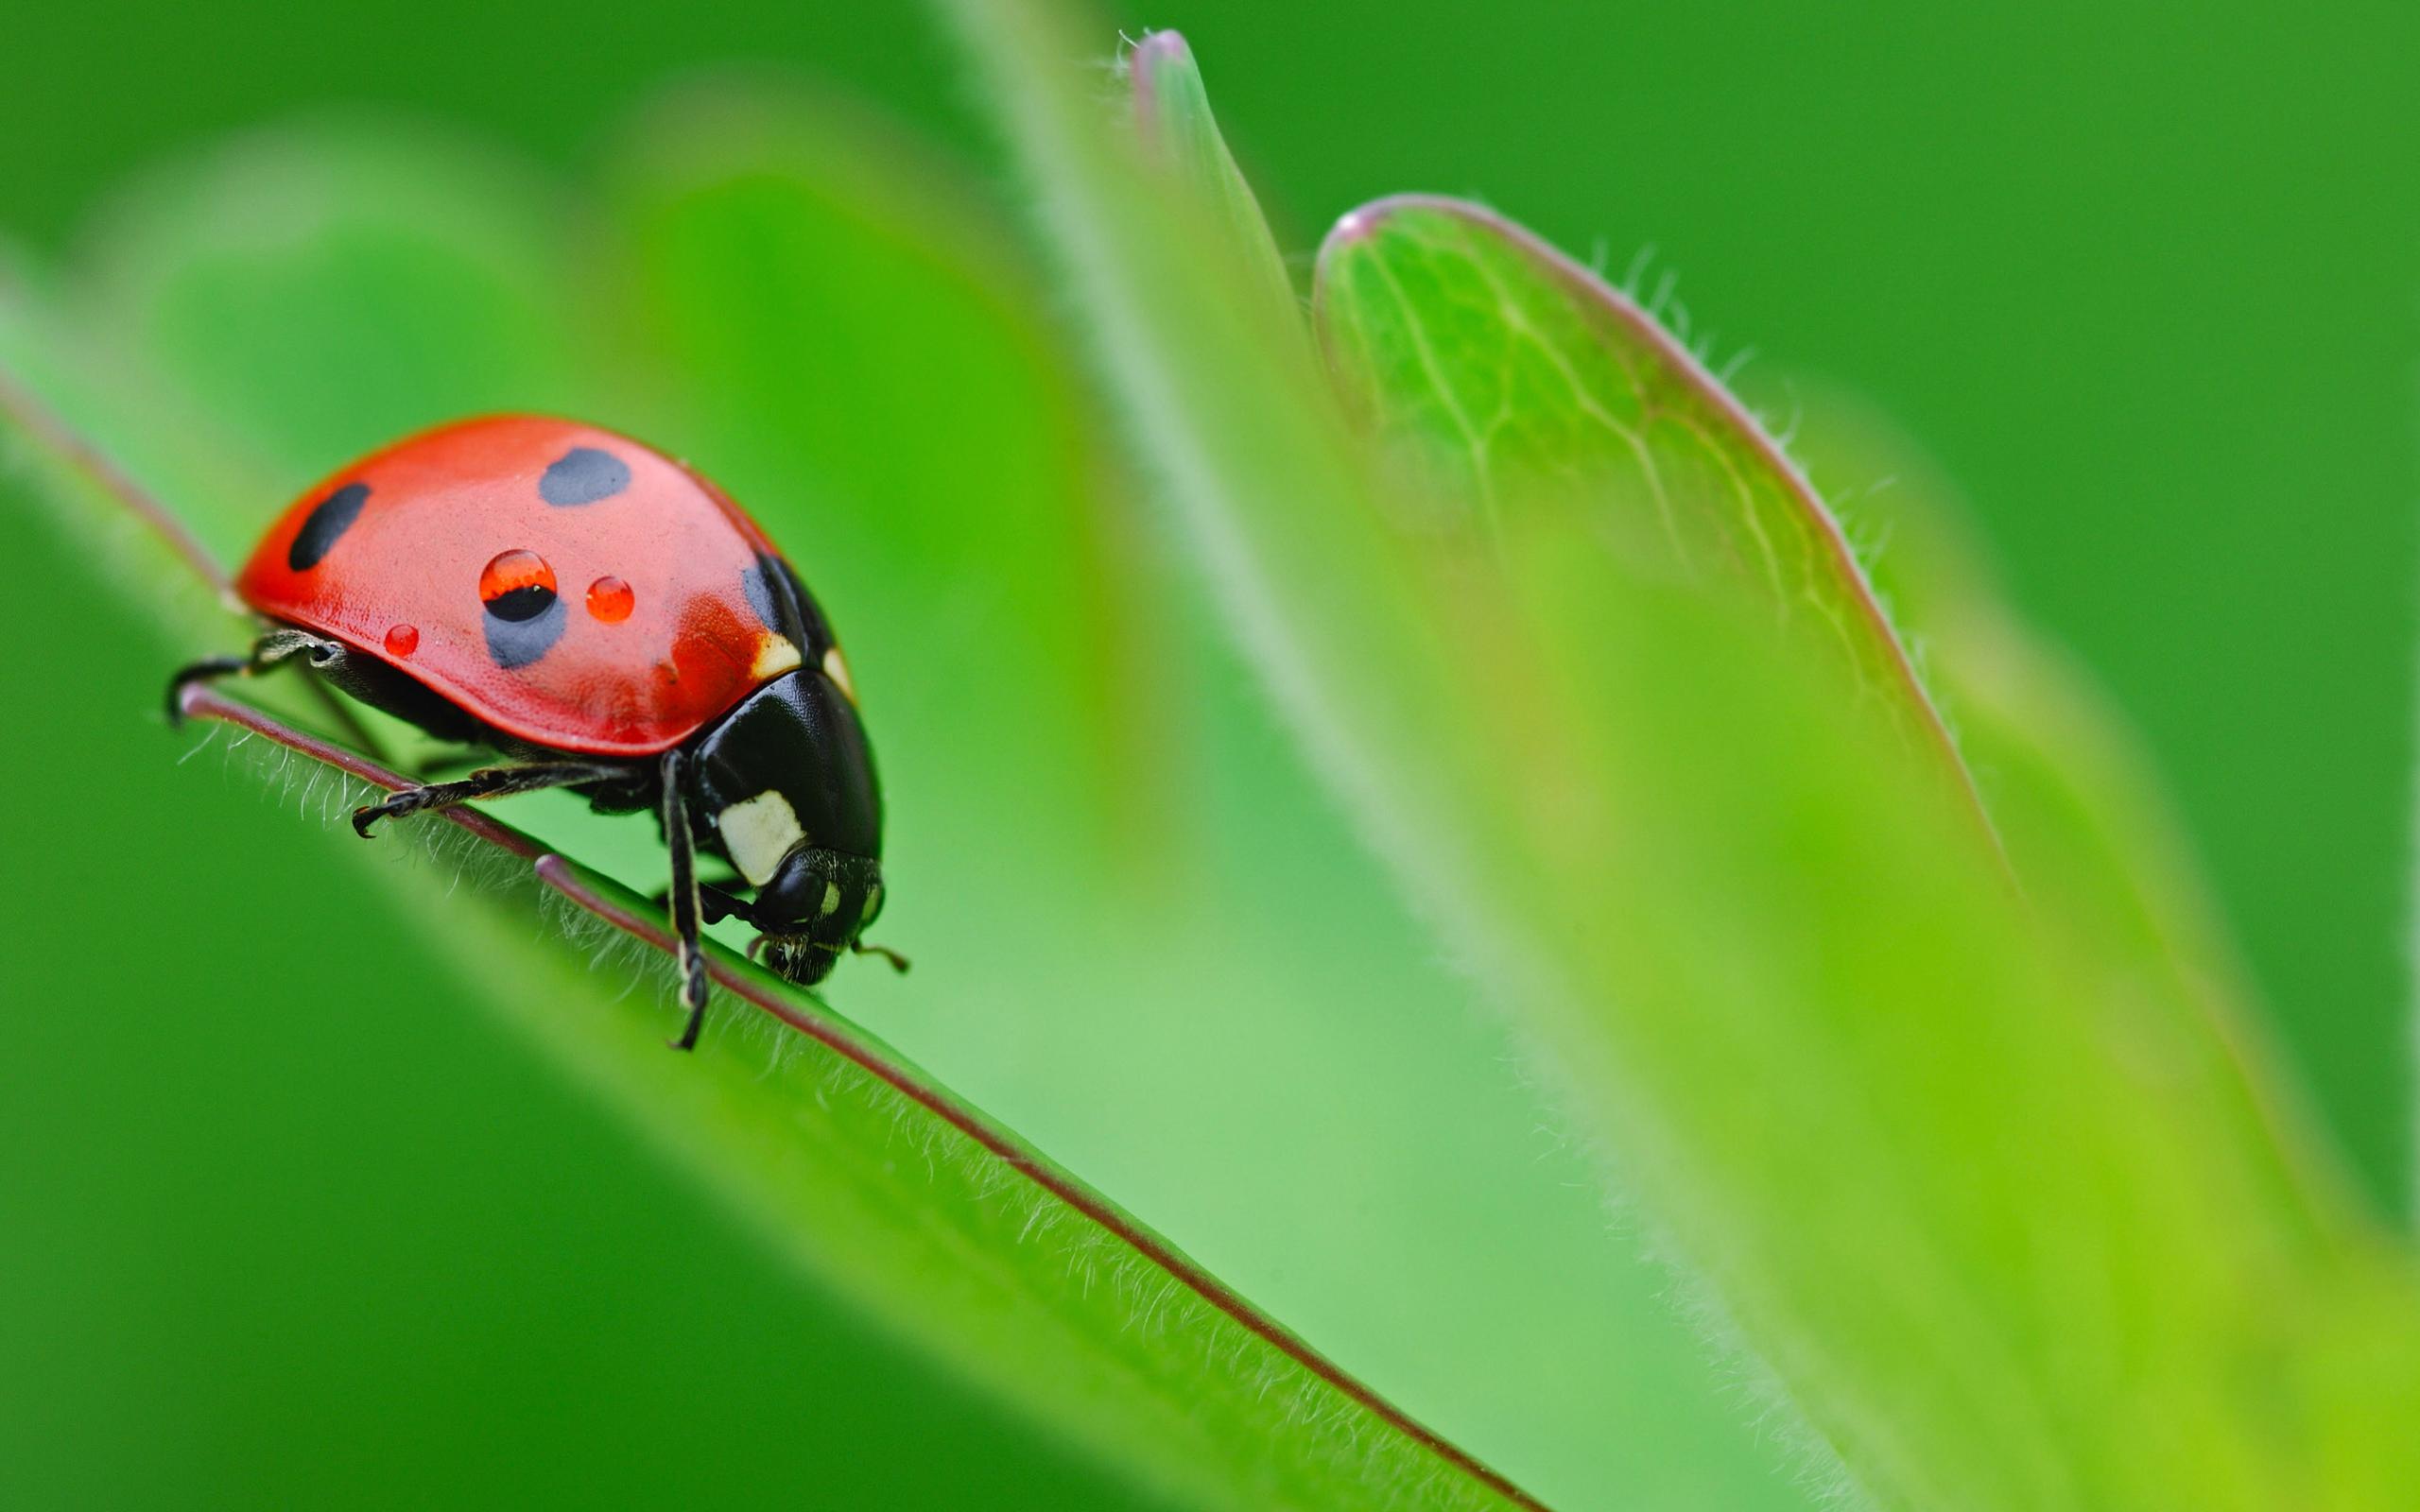 Ladybug · Ladybug · Ladybug Wallpaper · Ladybug Wallpaper ...